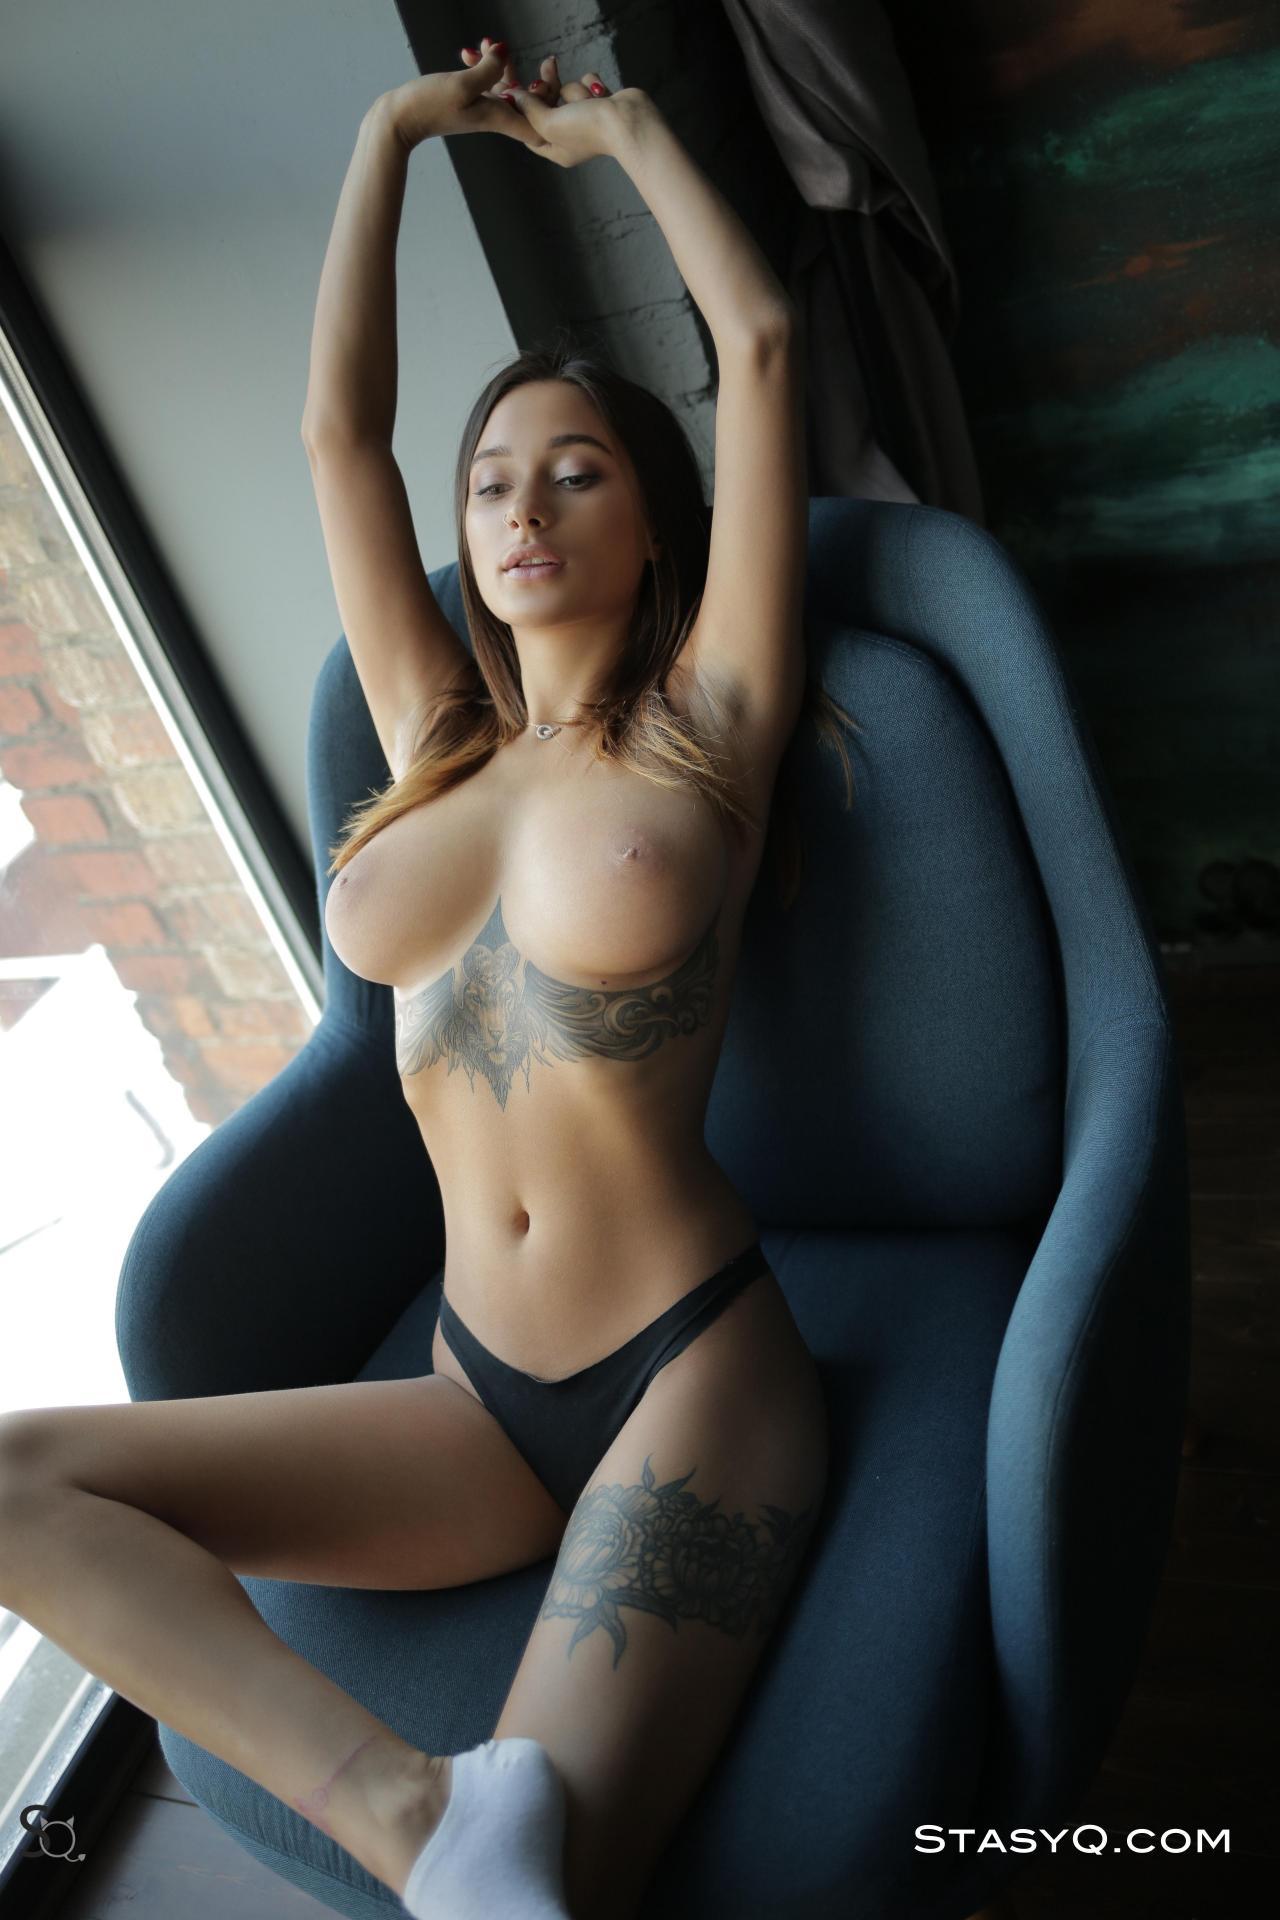 Kristina Shcherbinina Nude Pics